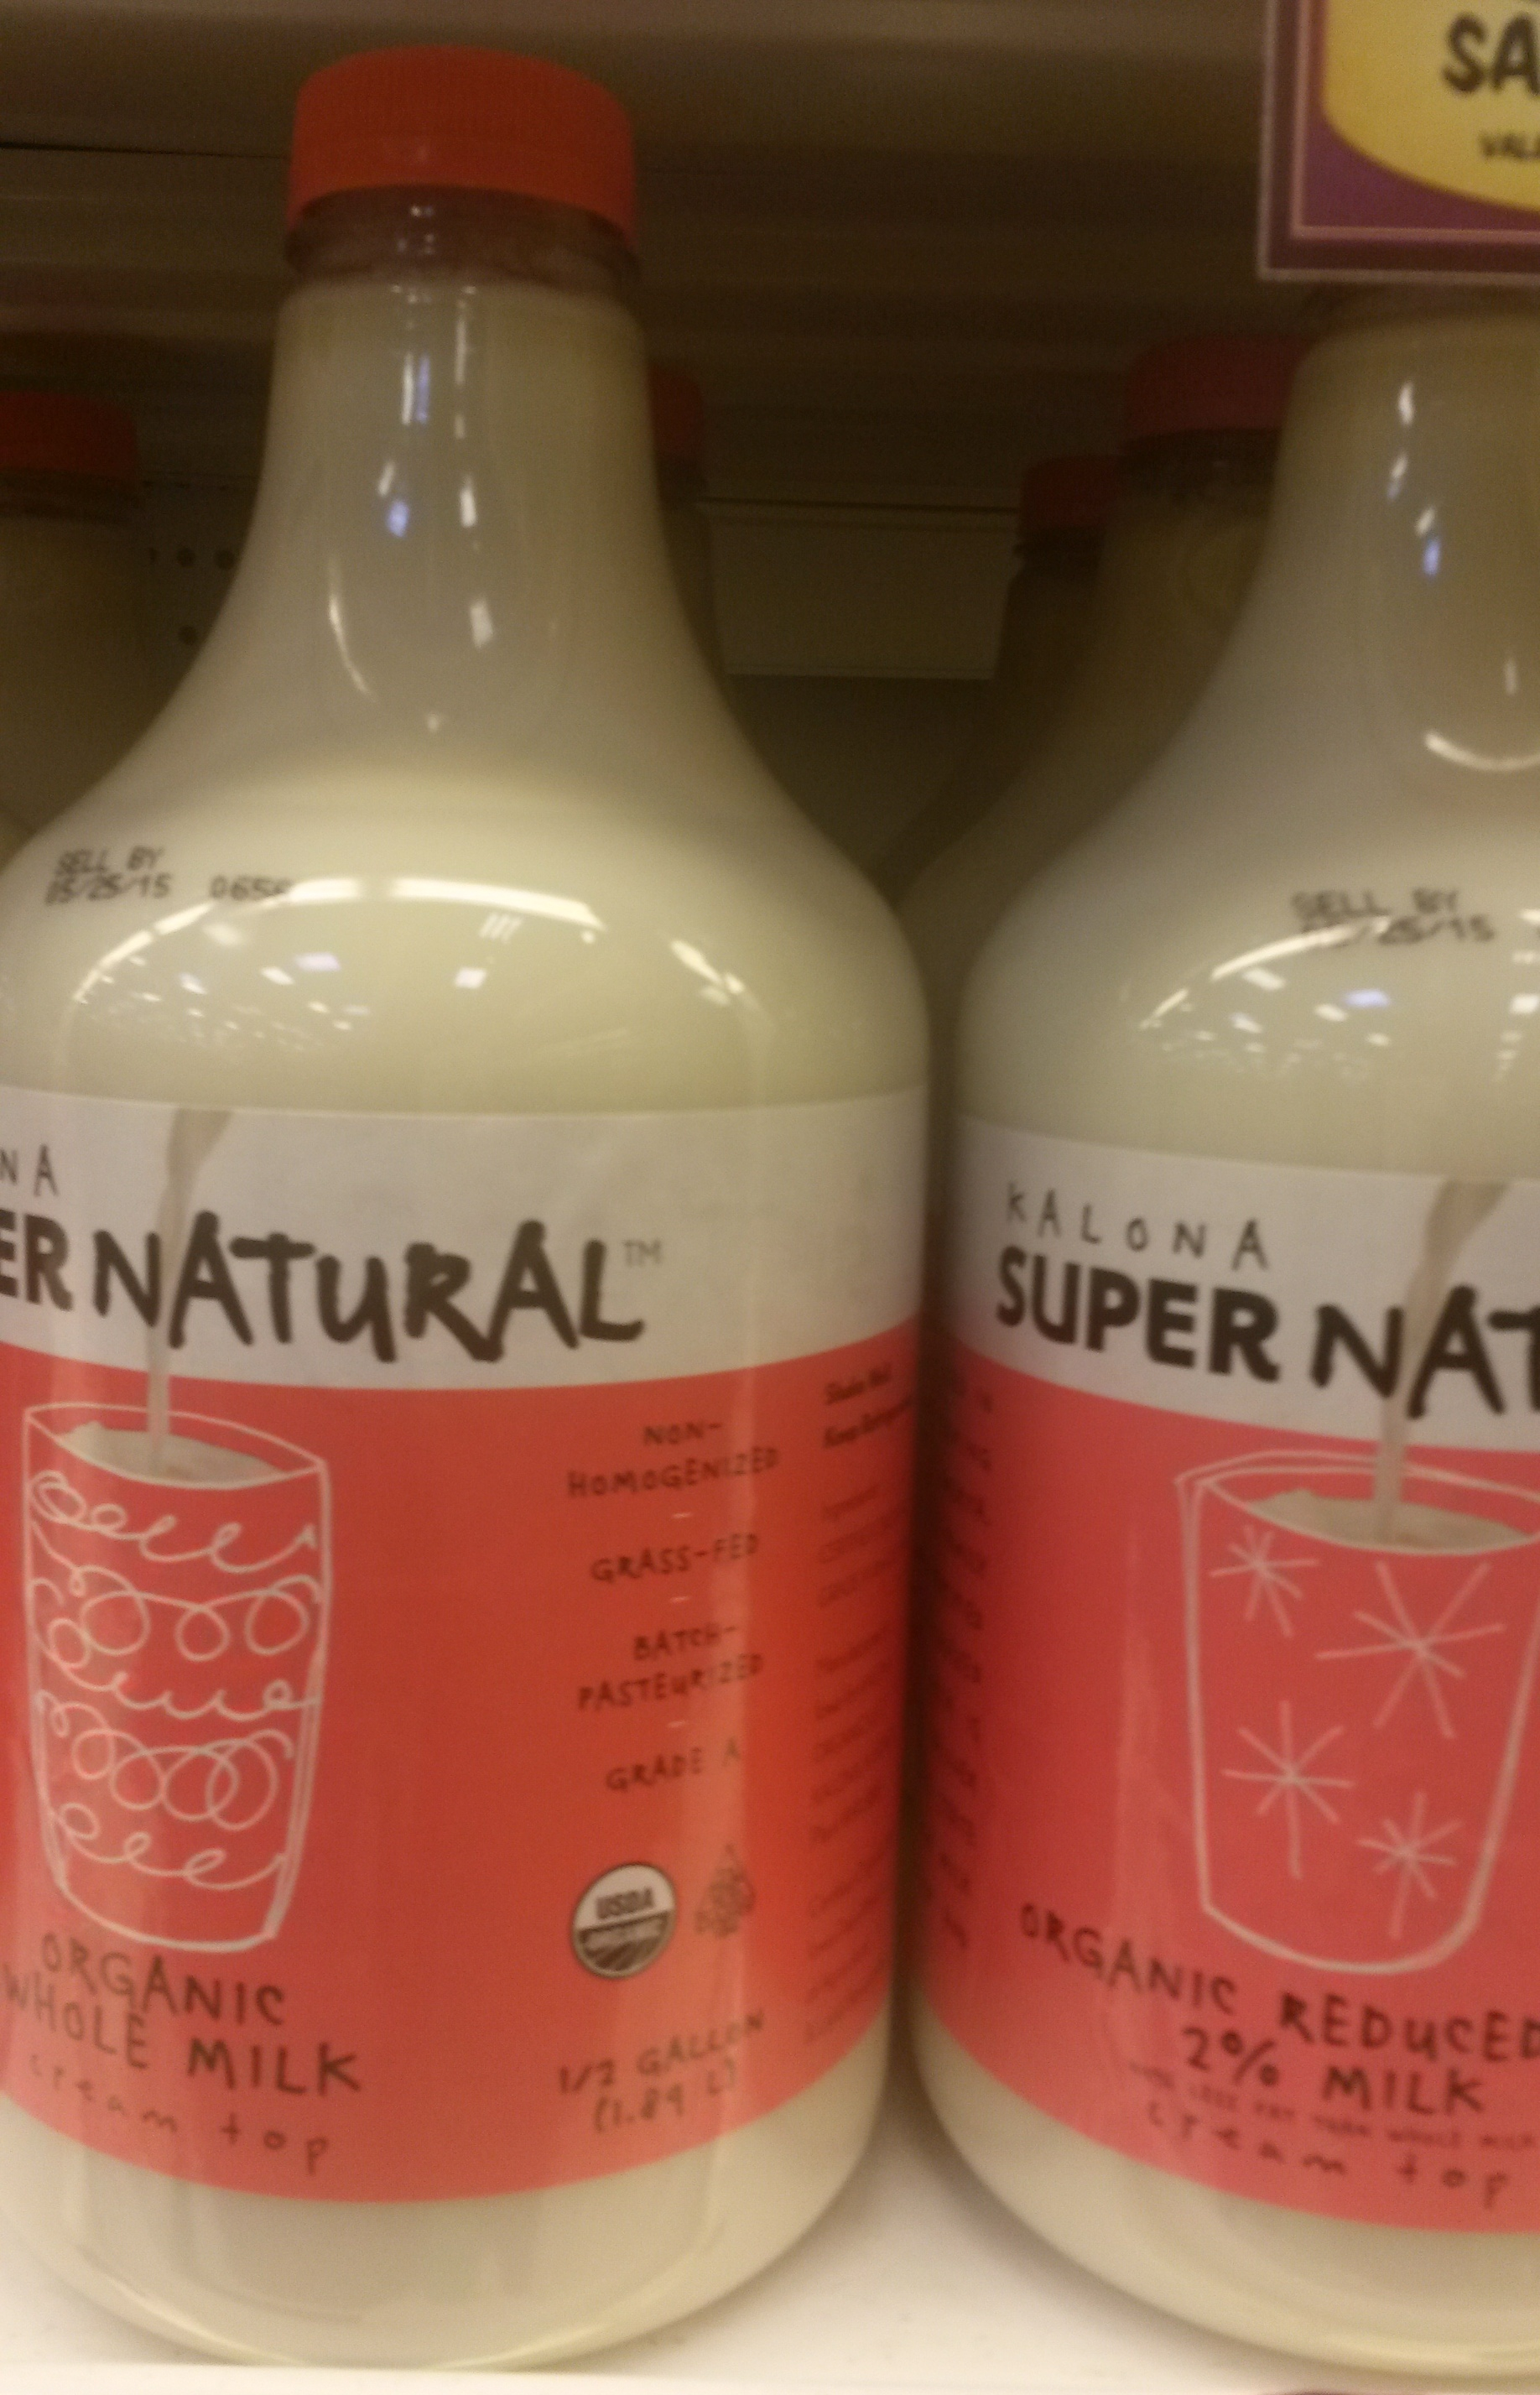 Non-homogenized organic milk